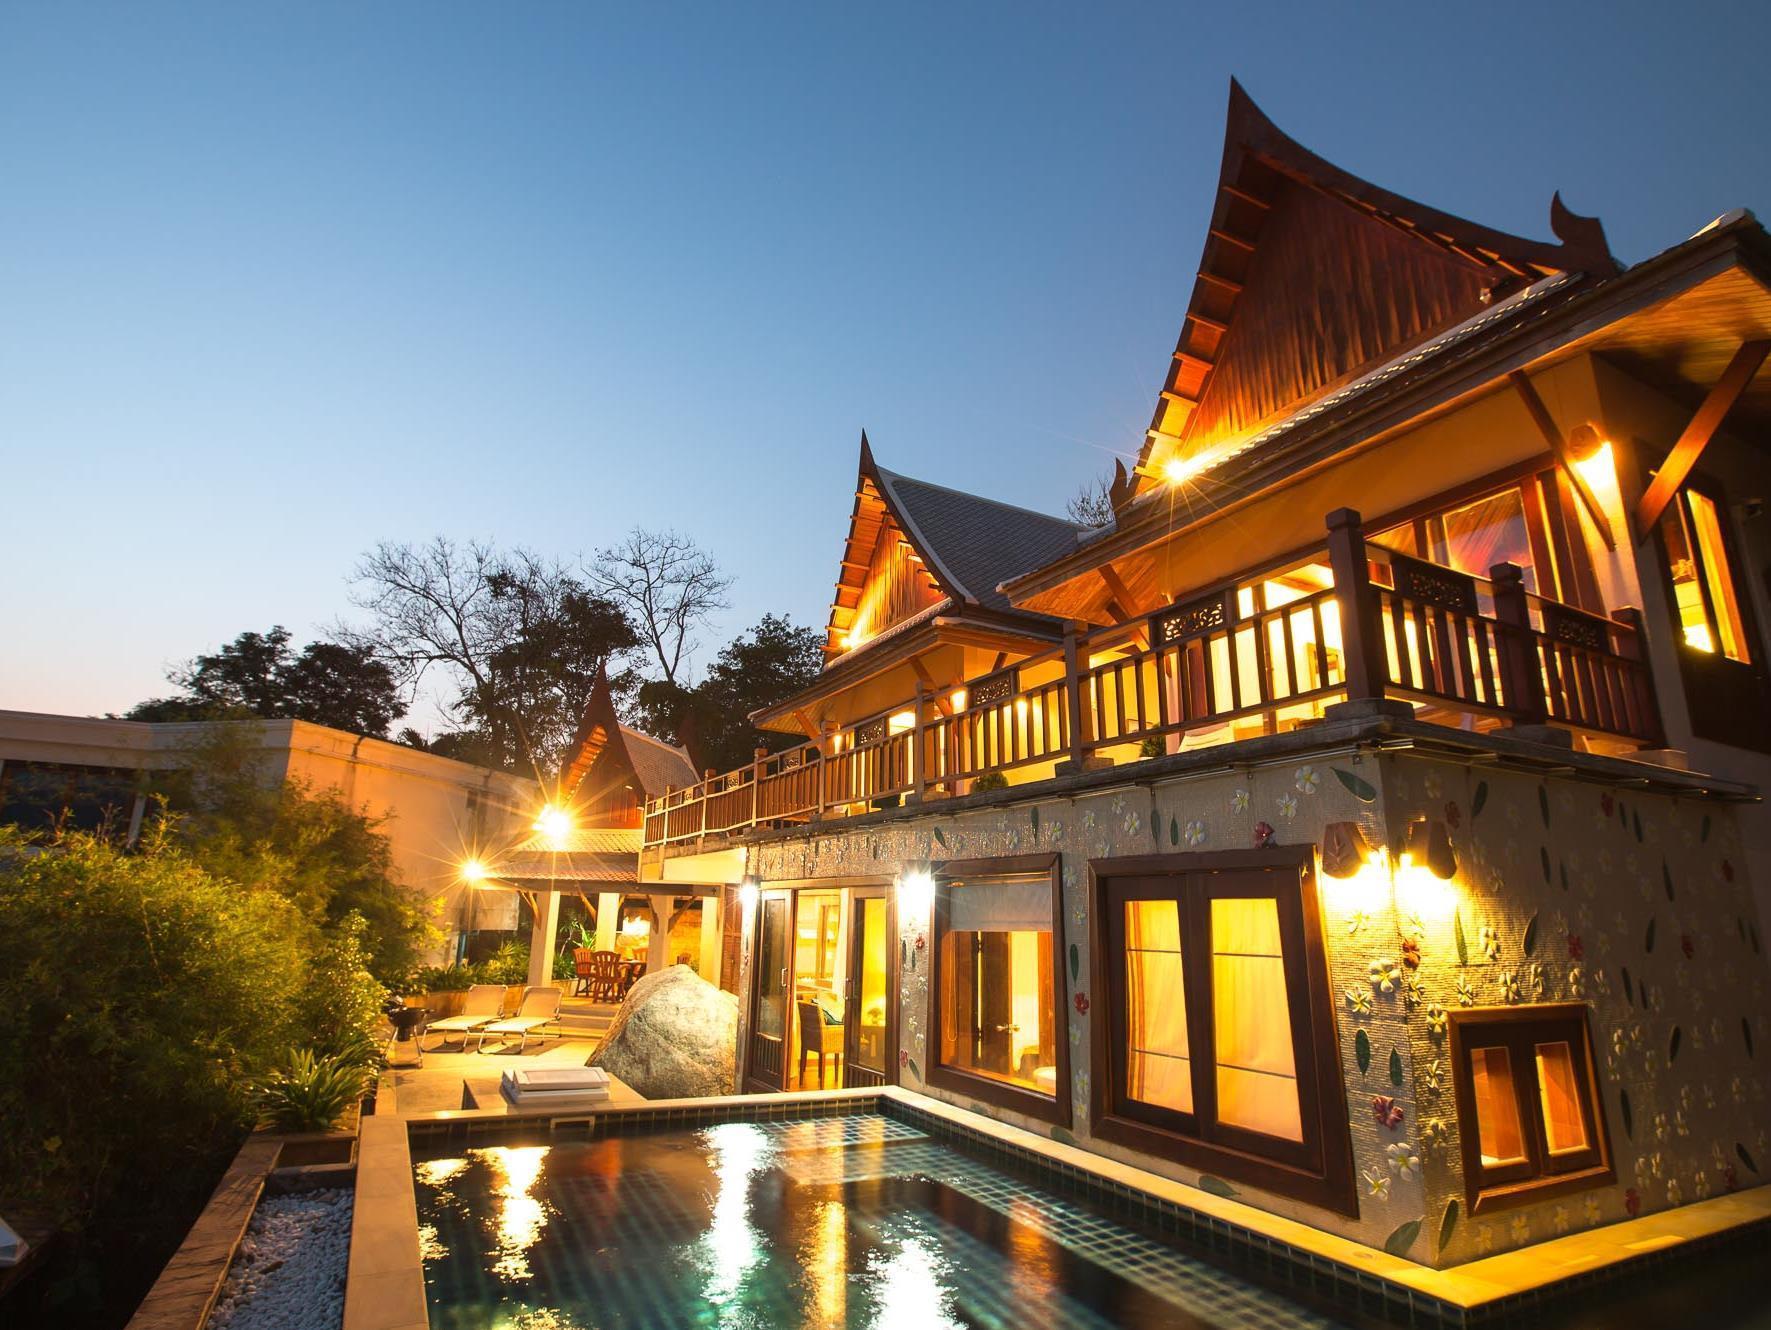 Phana Residence Phuket